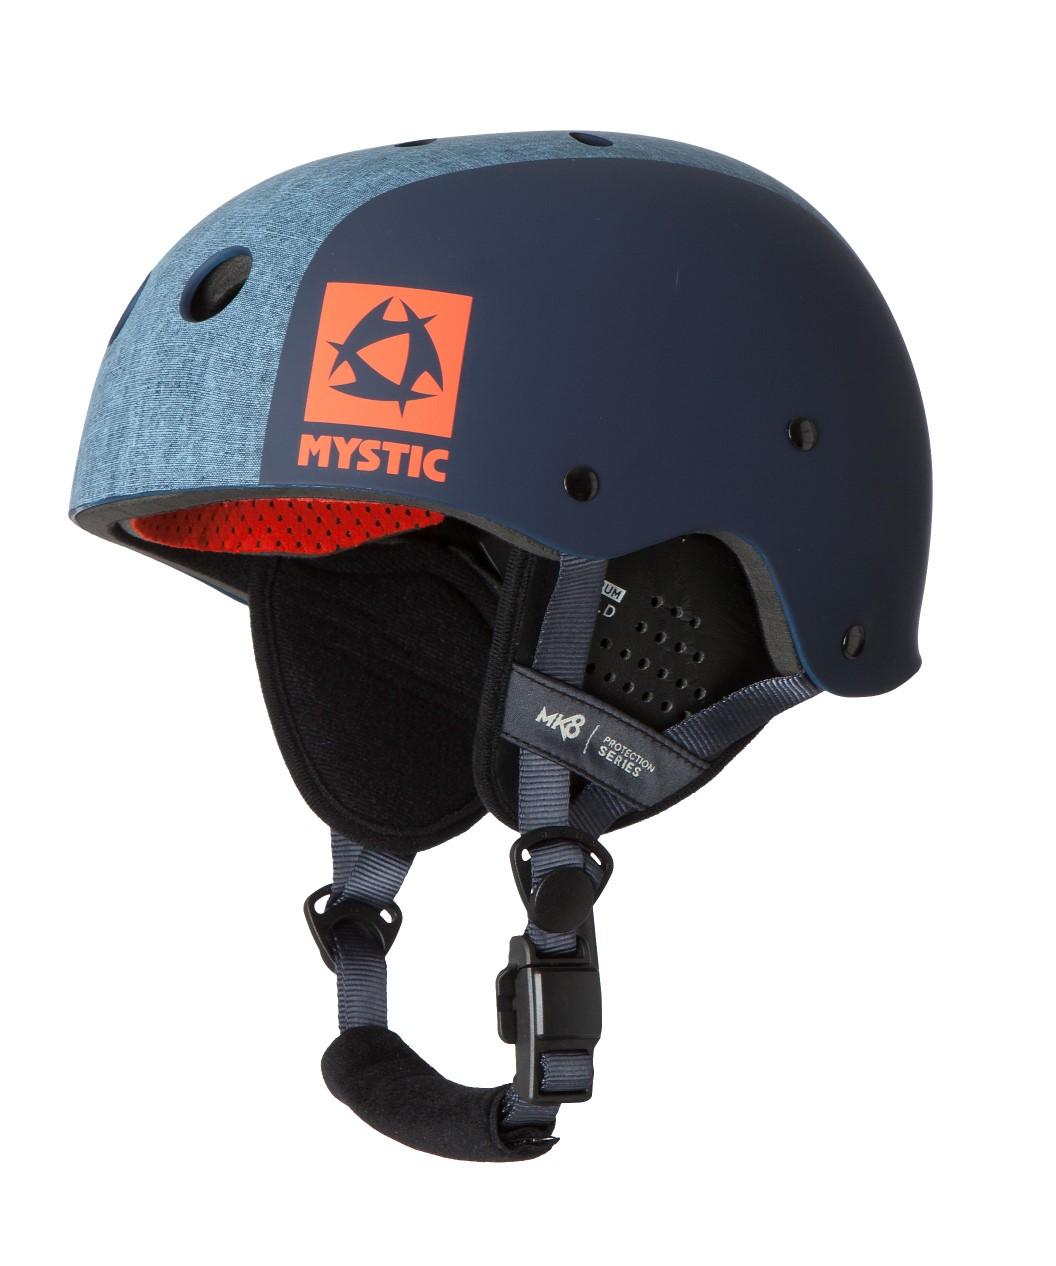 MK8 X HELMET - DENIM MYSTIC 2016